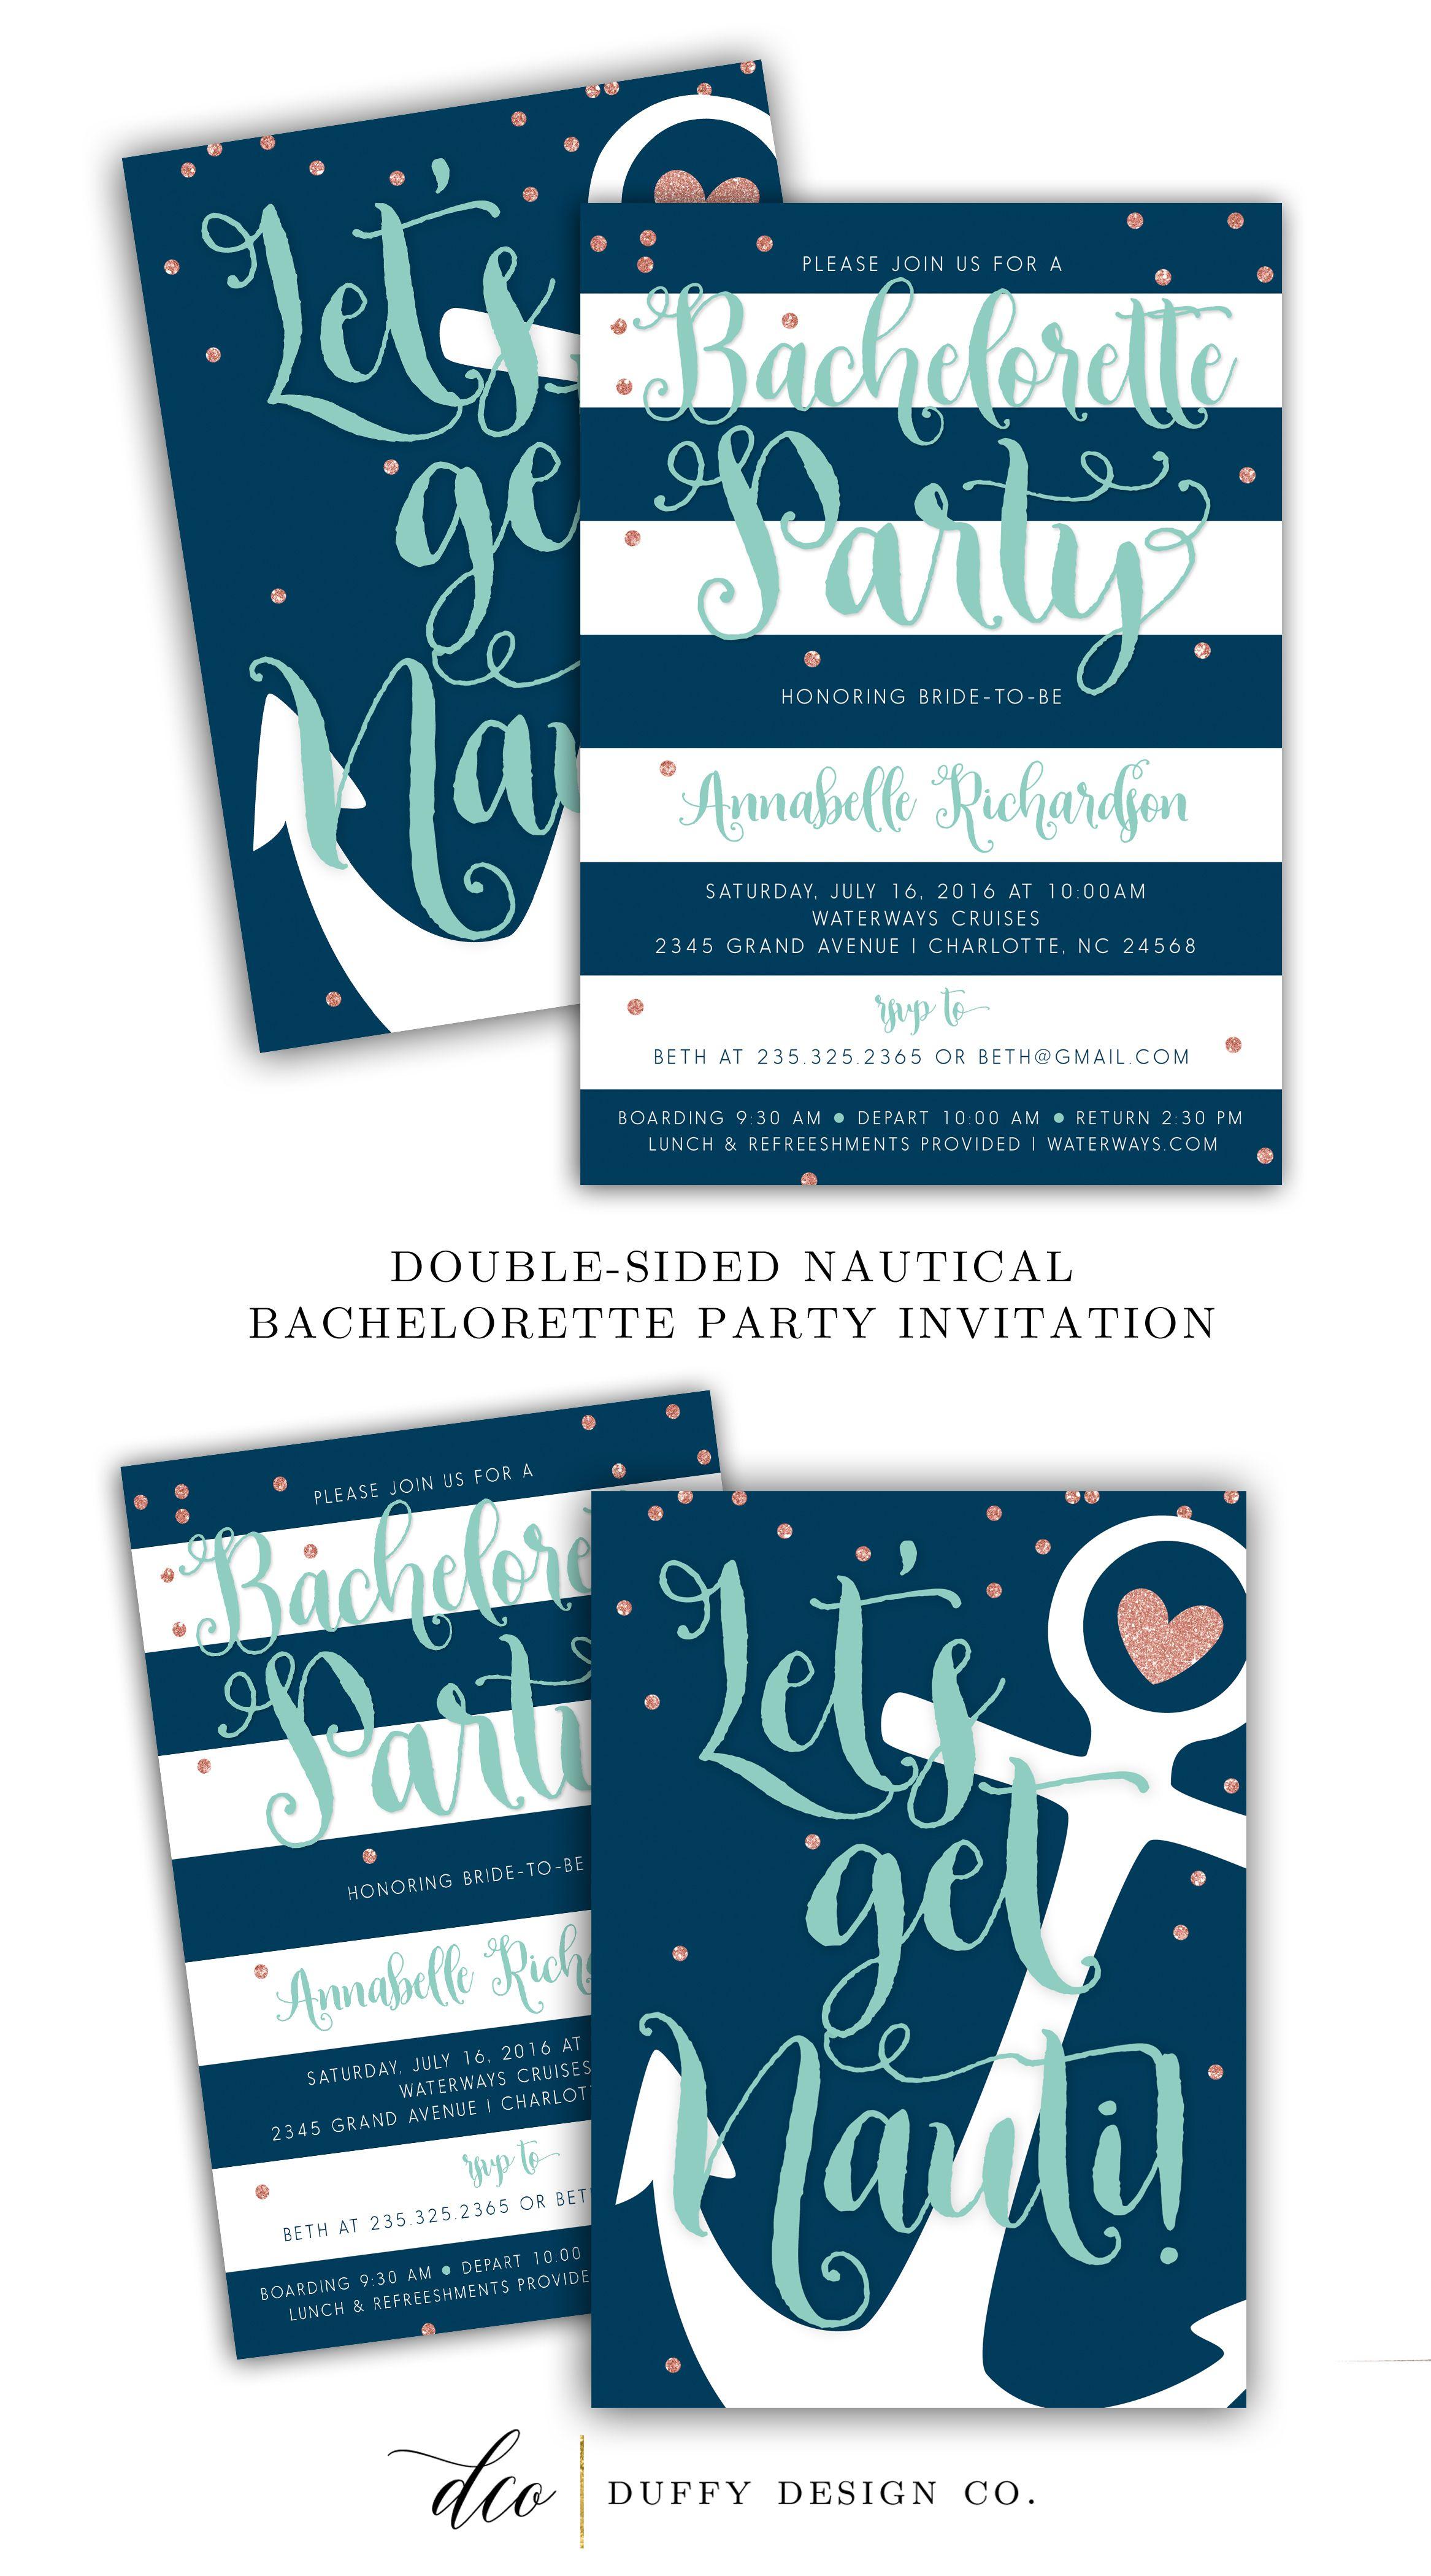 Personalized Bachelorette Invitations | Available at BOARDMAN ...